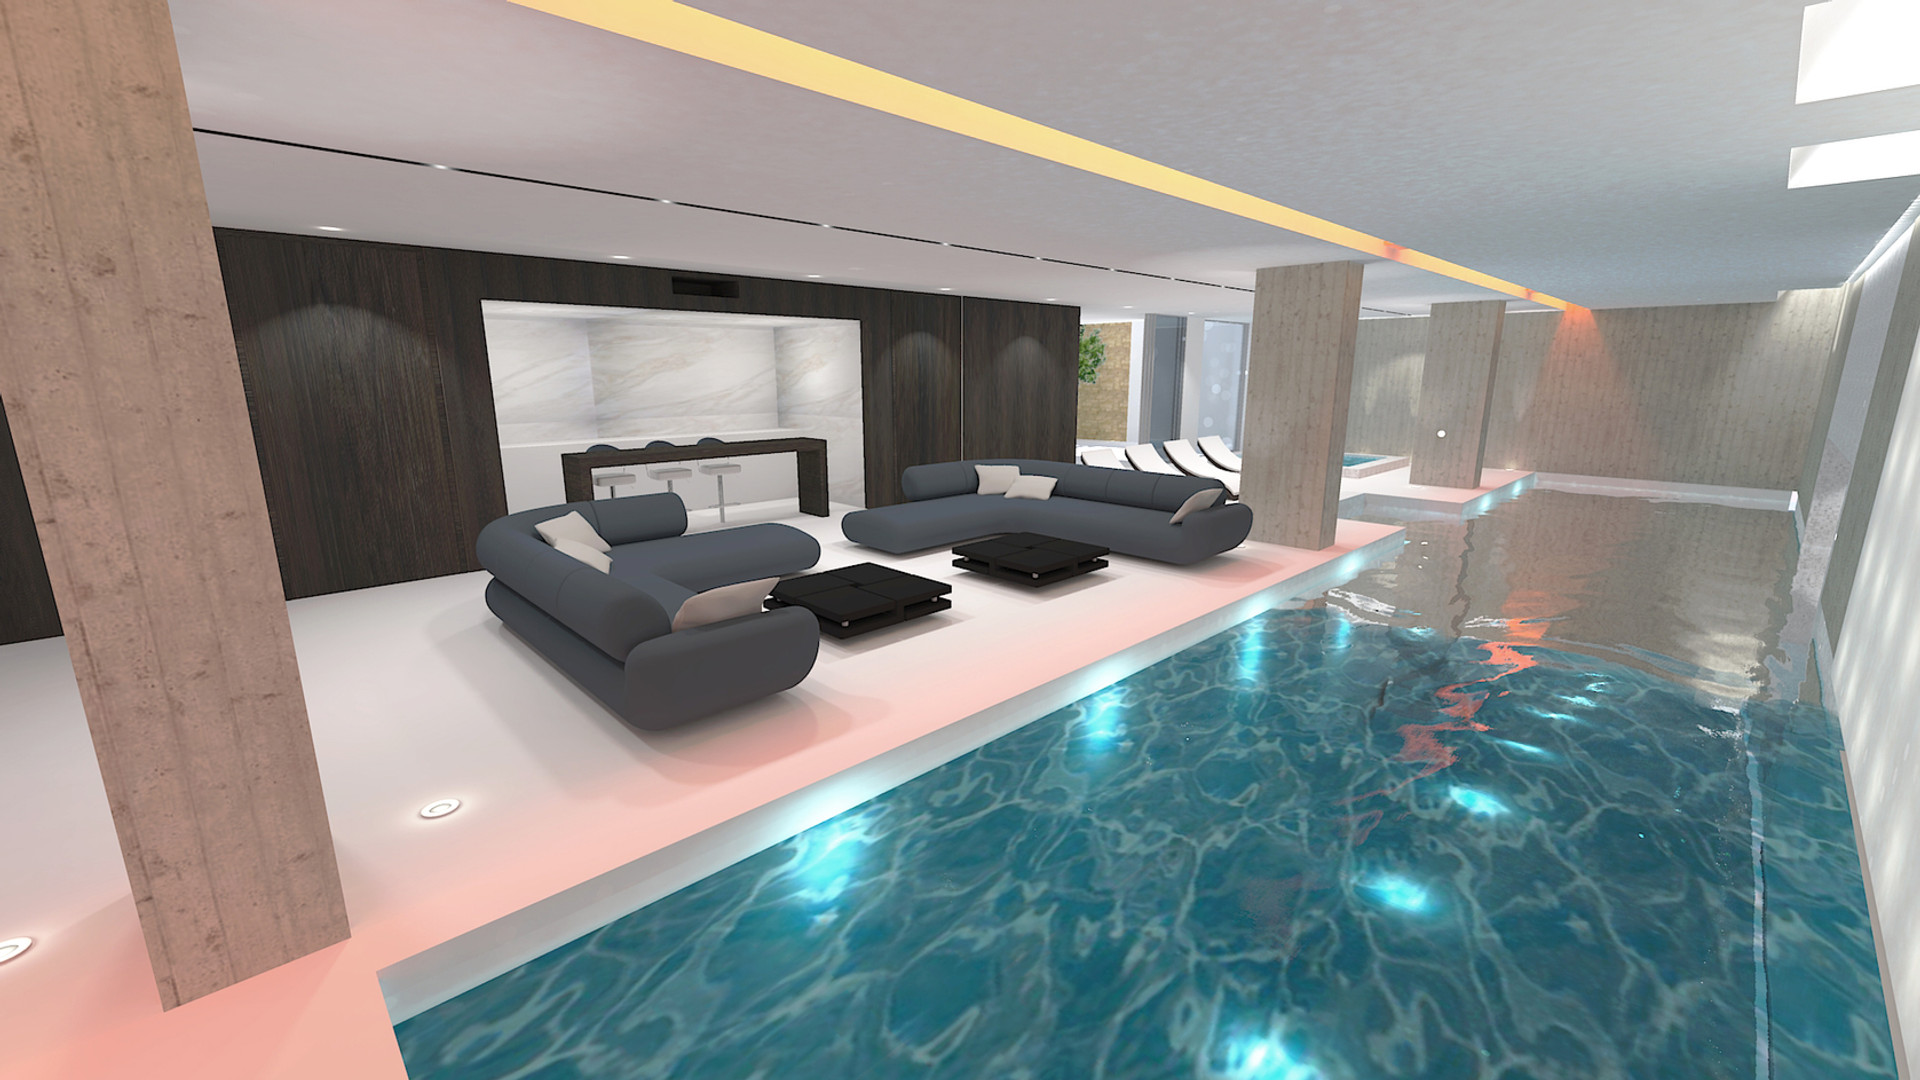 Swimming pool visualisation 3D